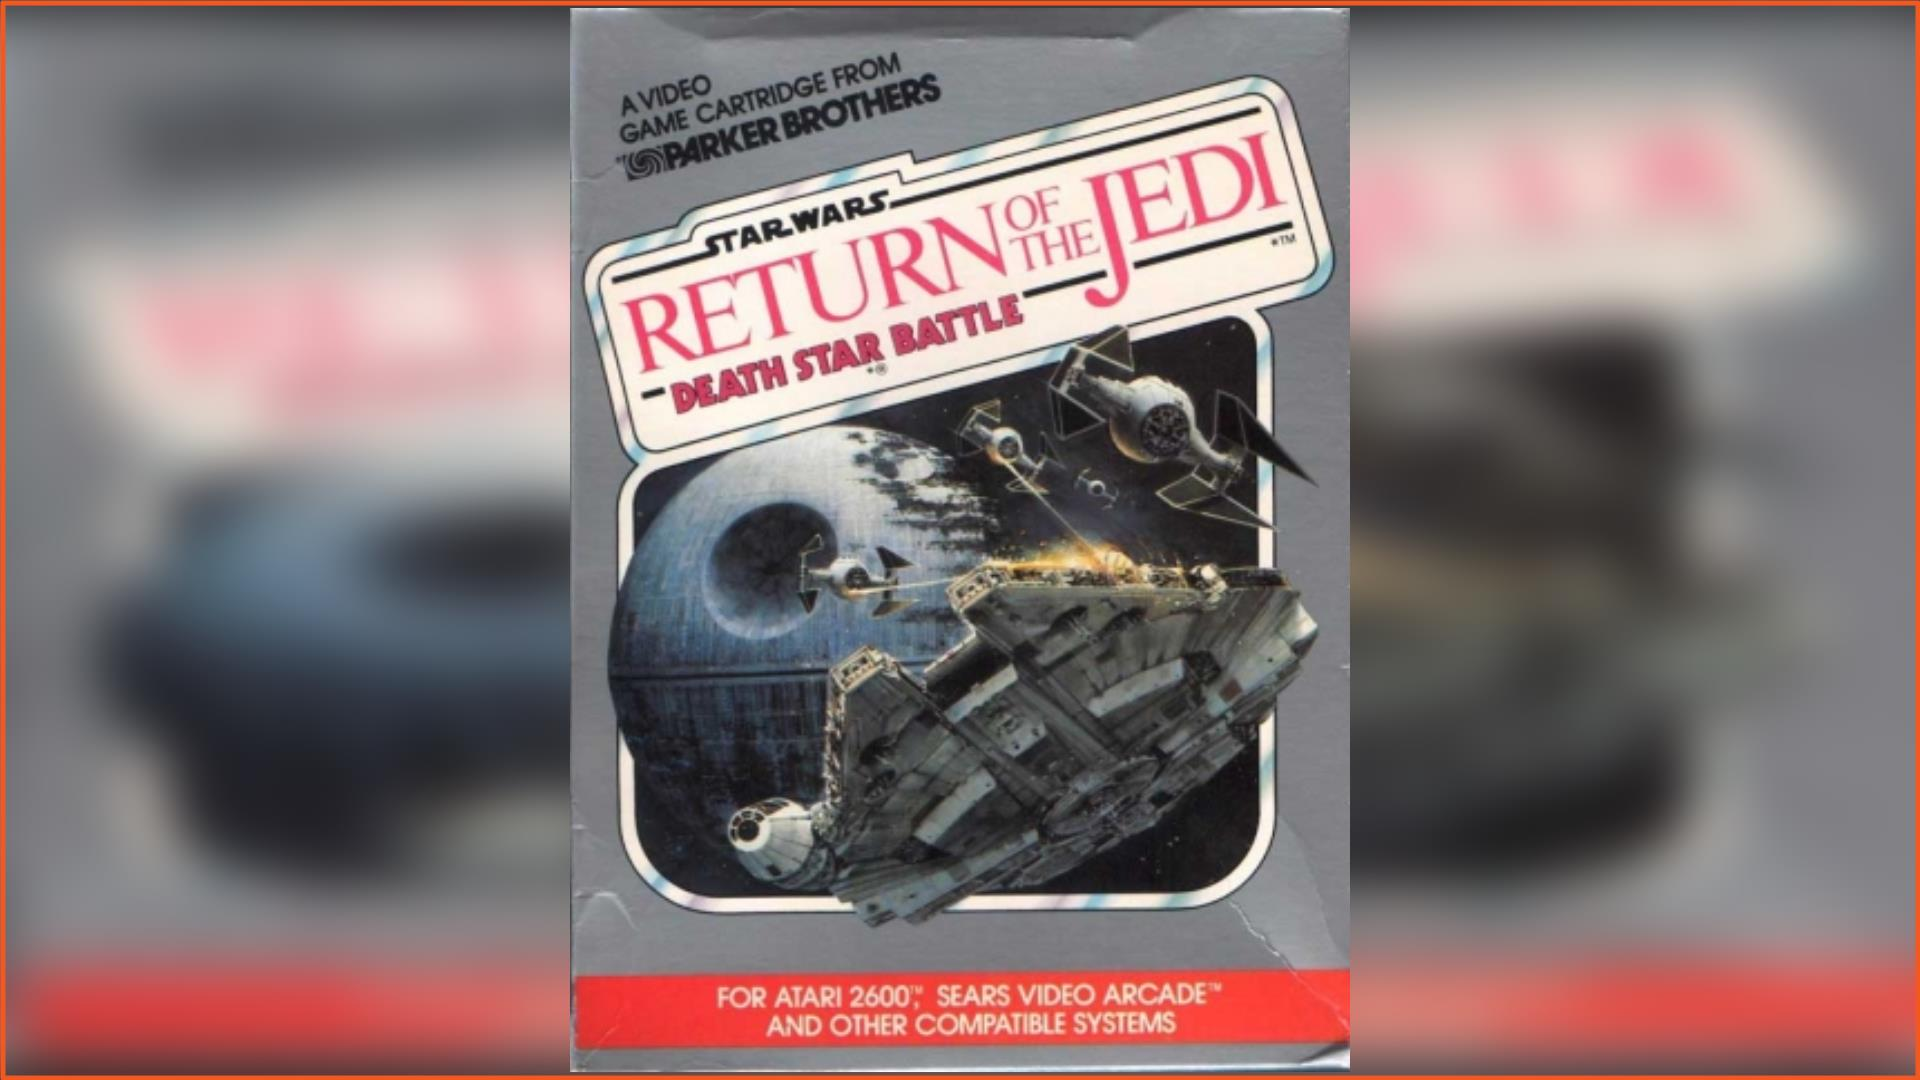 Return of the Jedi Atari 2600 ROM Download